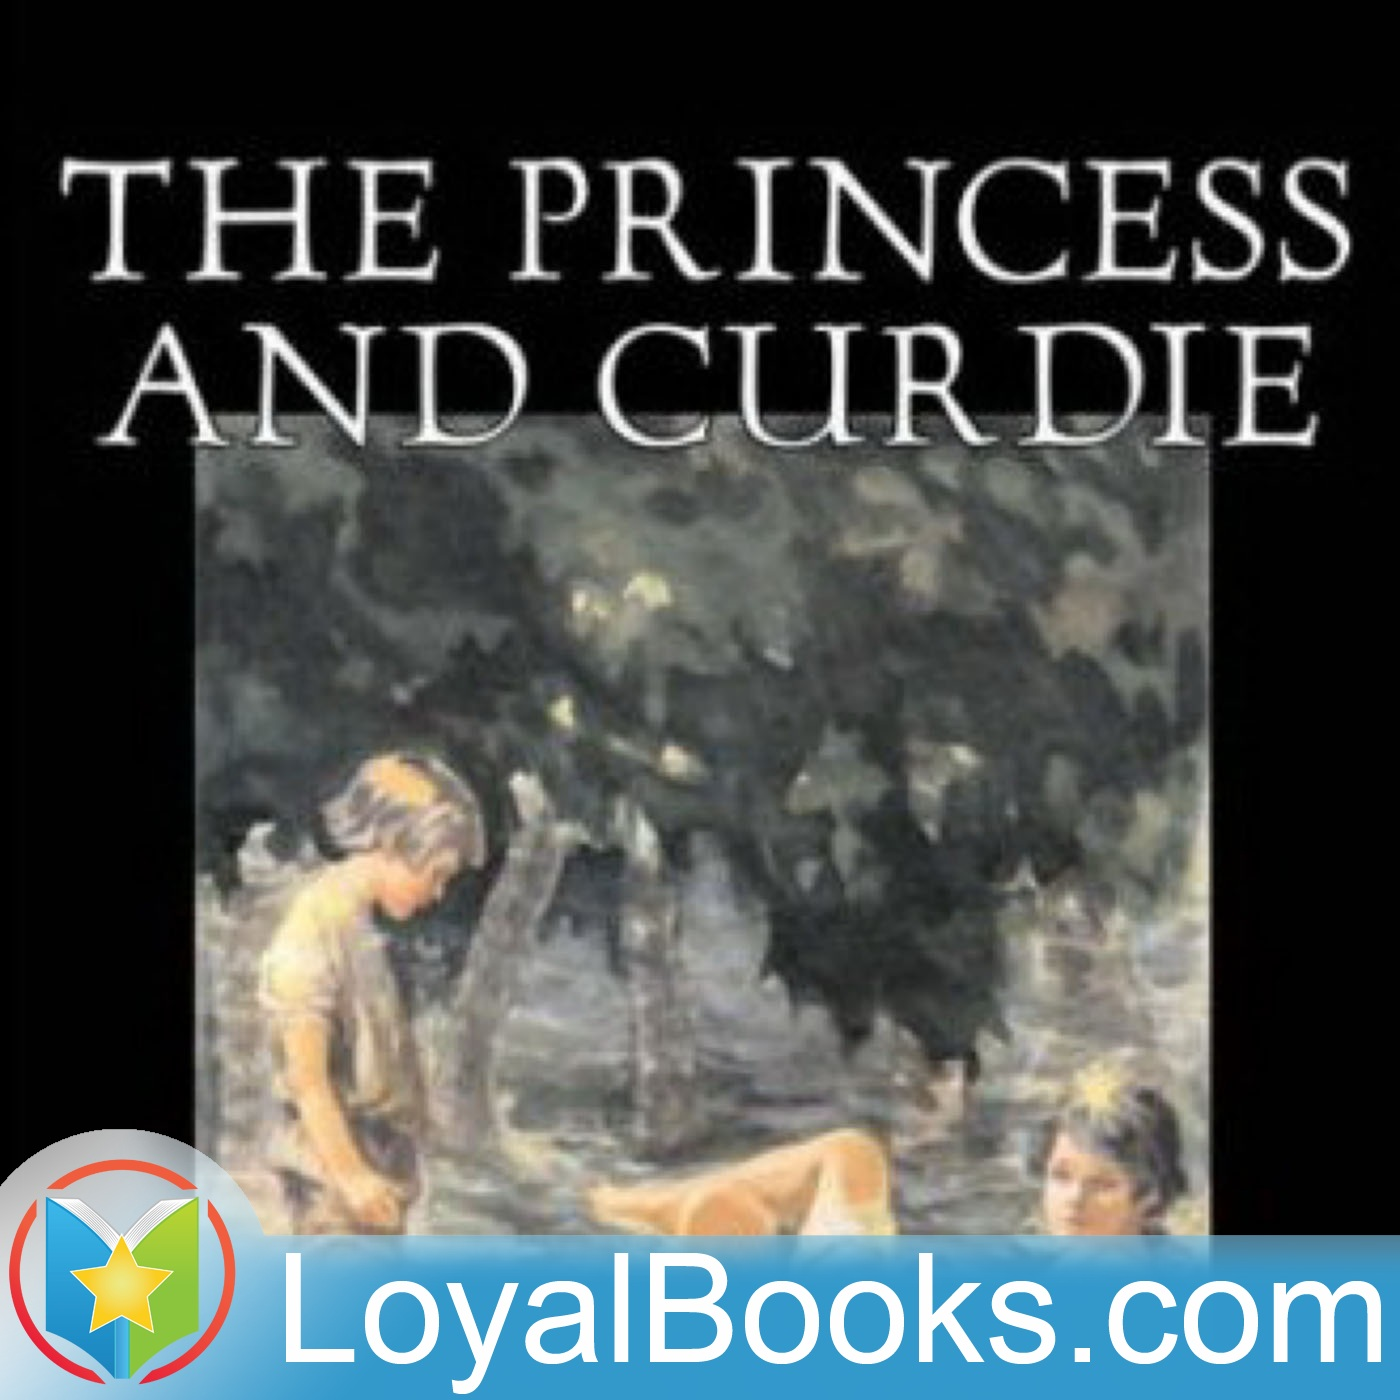 the princess and curdie macdonald george